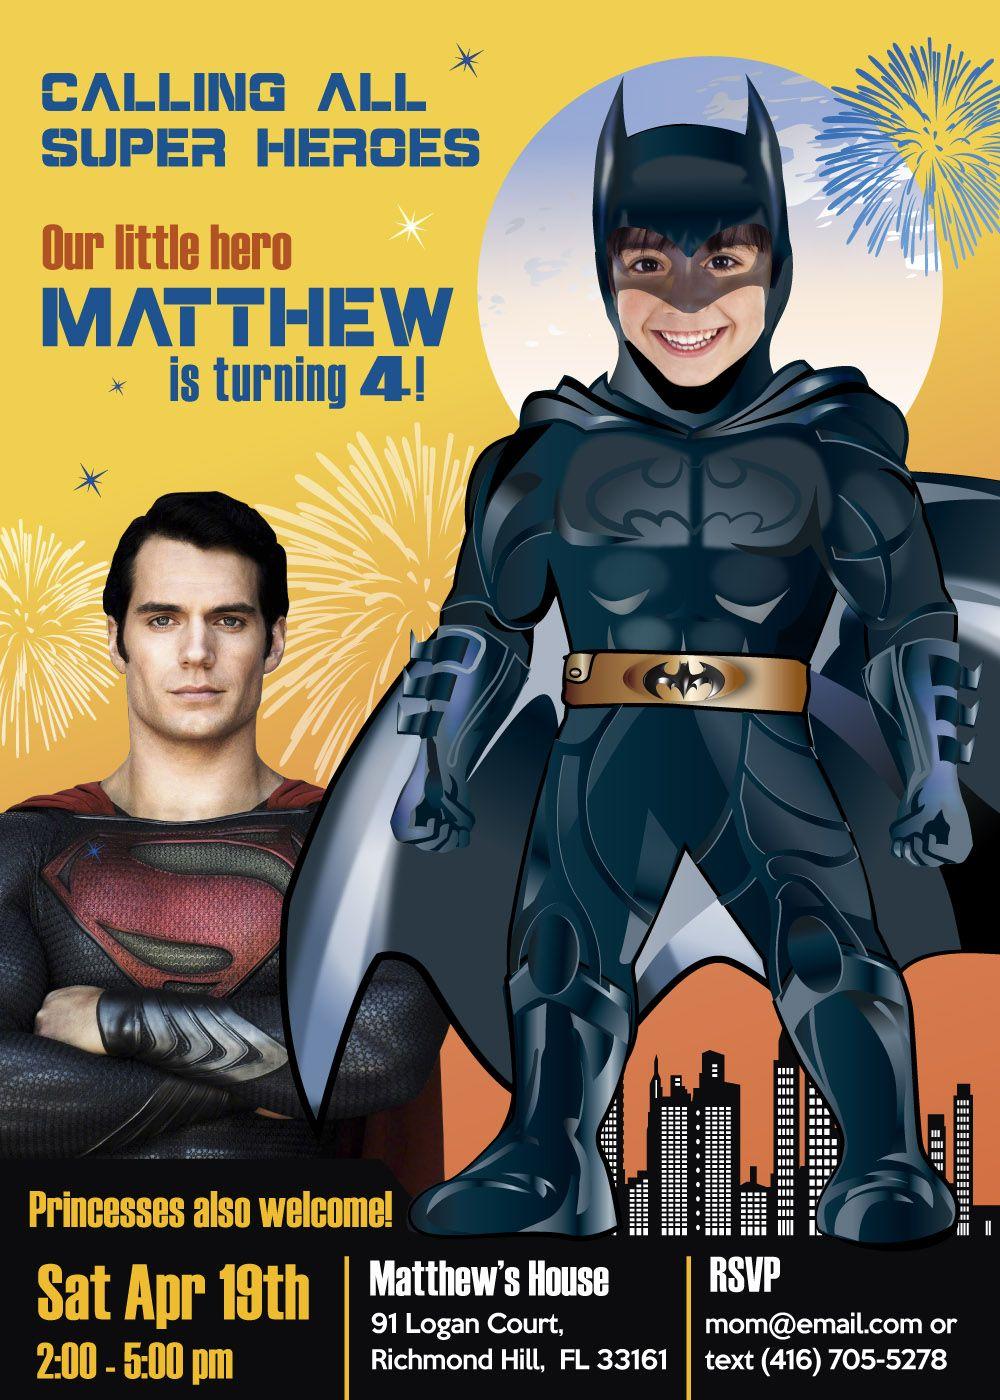 BATMAN vs SUPERMAN birthday party invitation Turn your kid into